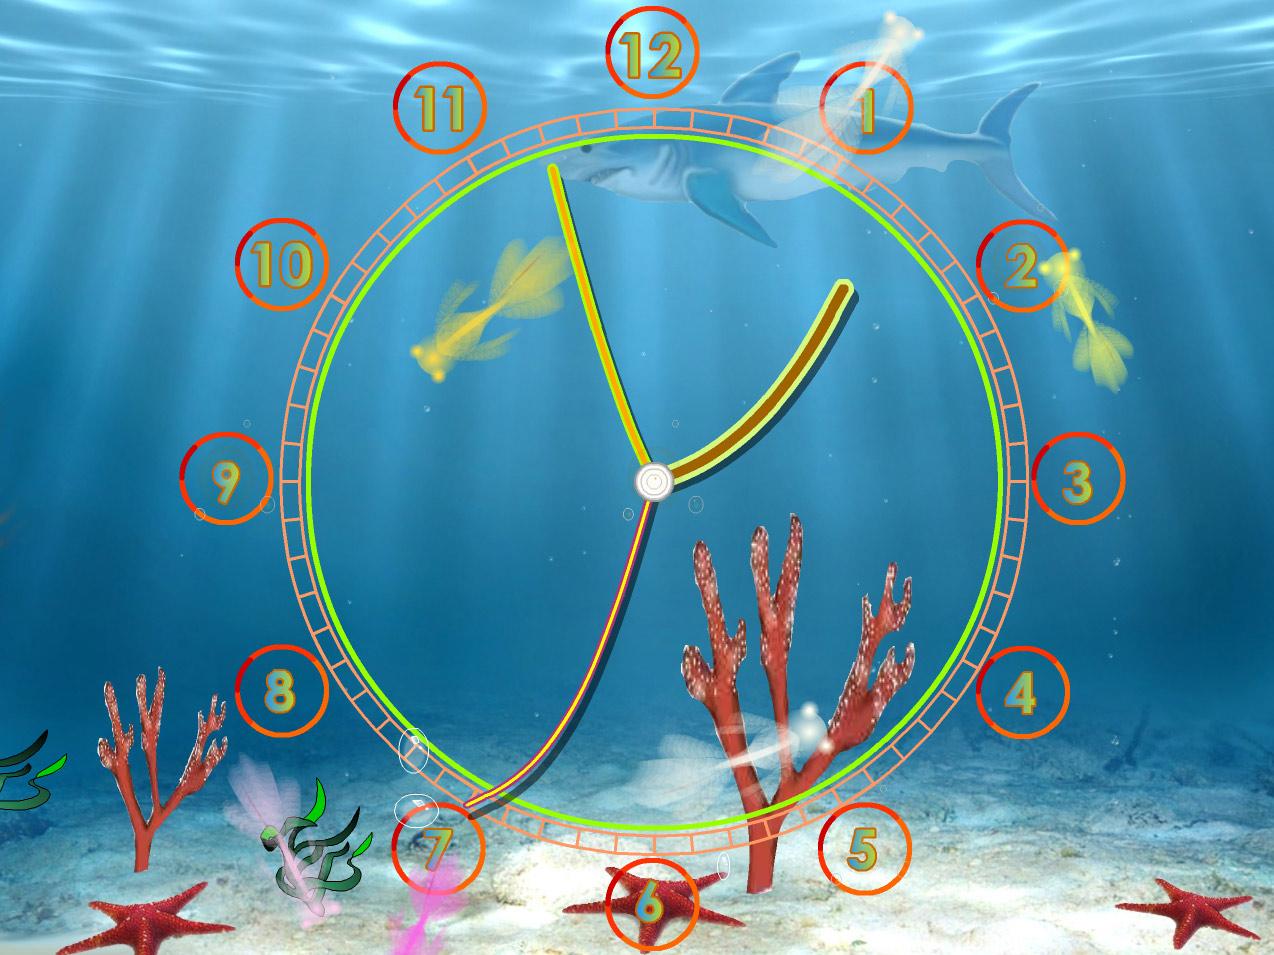 Calendar Clock Wallpaper : Aquarium clock screensaver: always know the current time with fun!